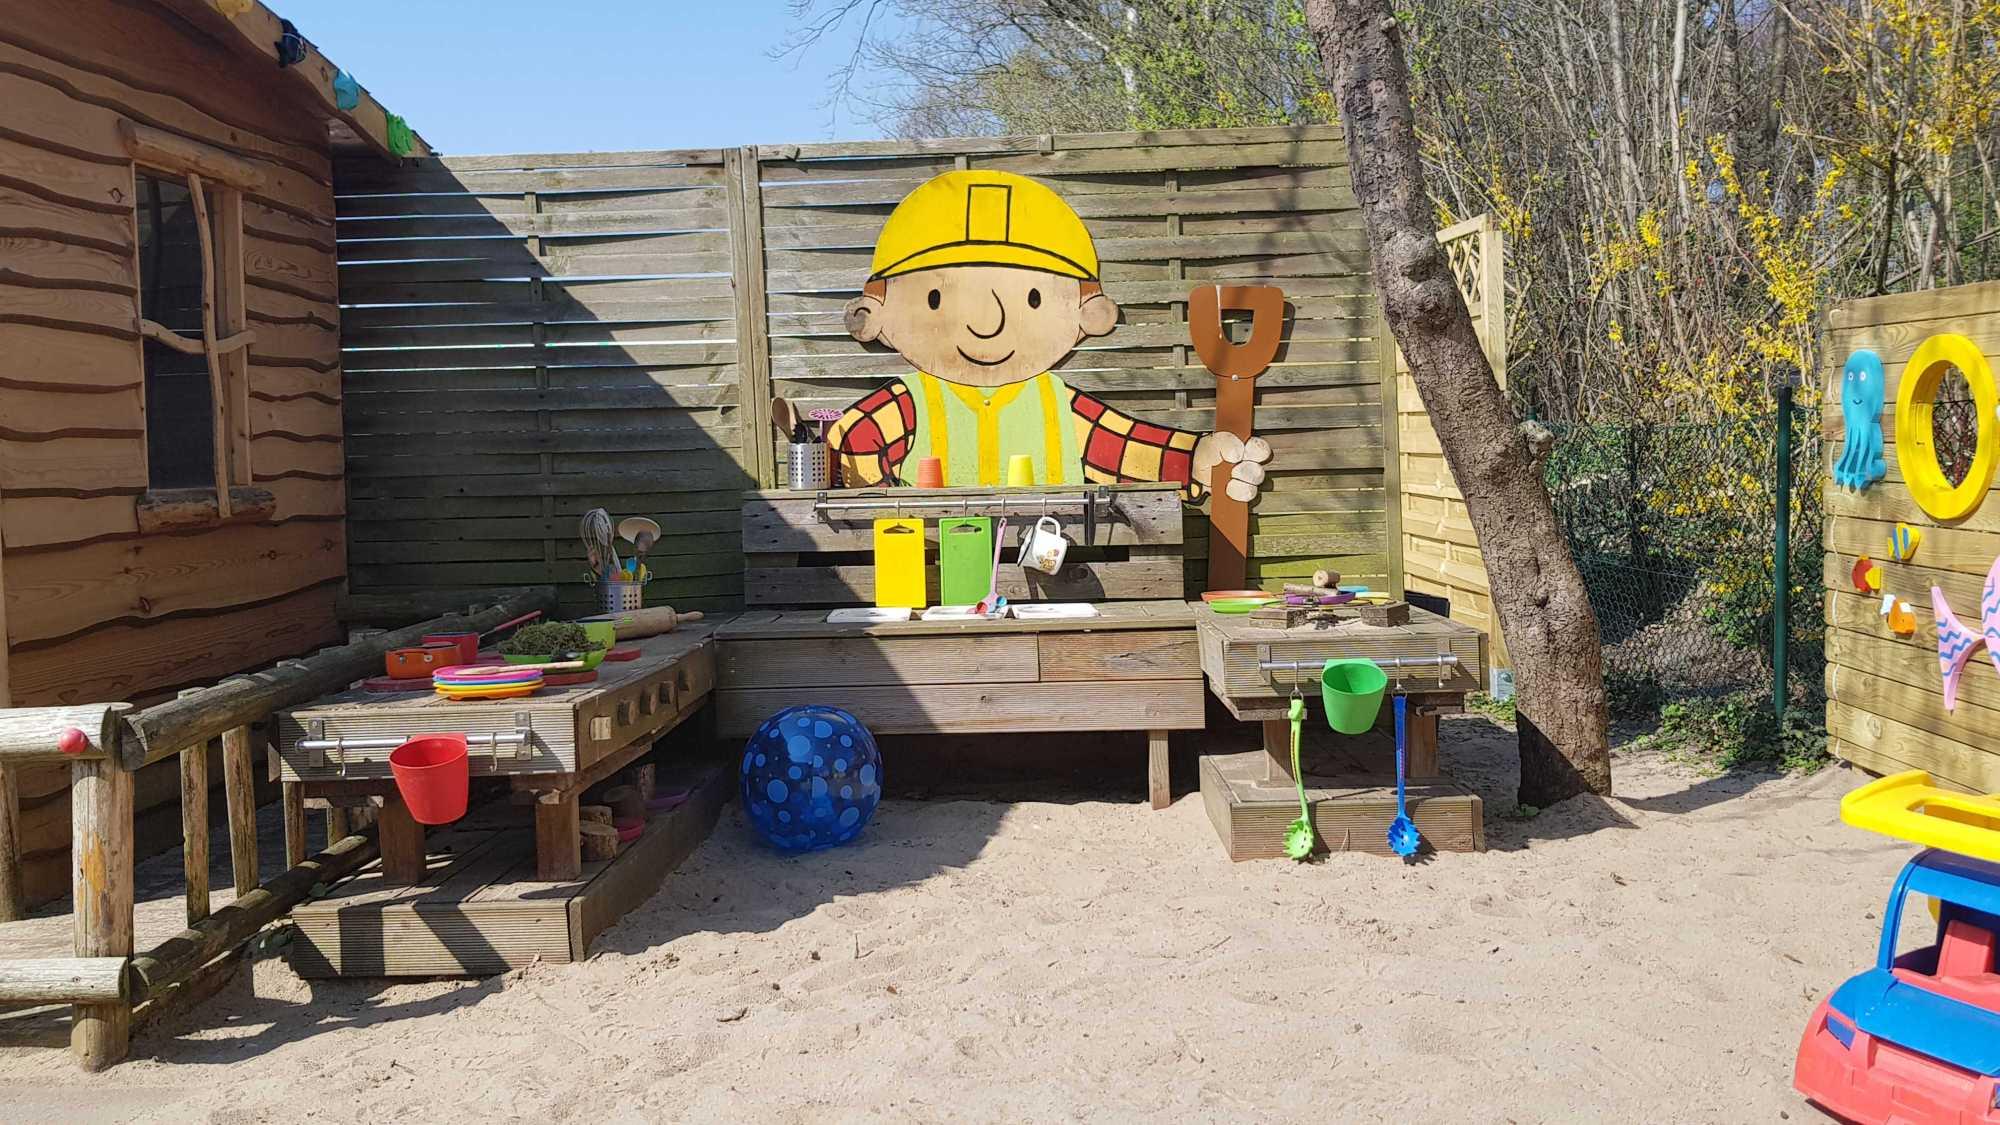 Kita Kid Zone Kinderbetreuung Garten1 18 - Kinder-Beachclub